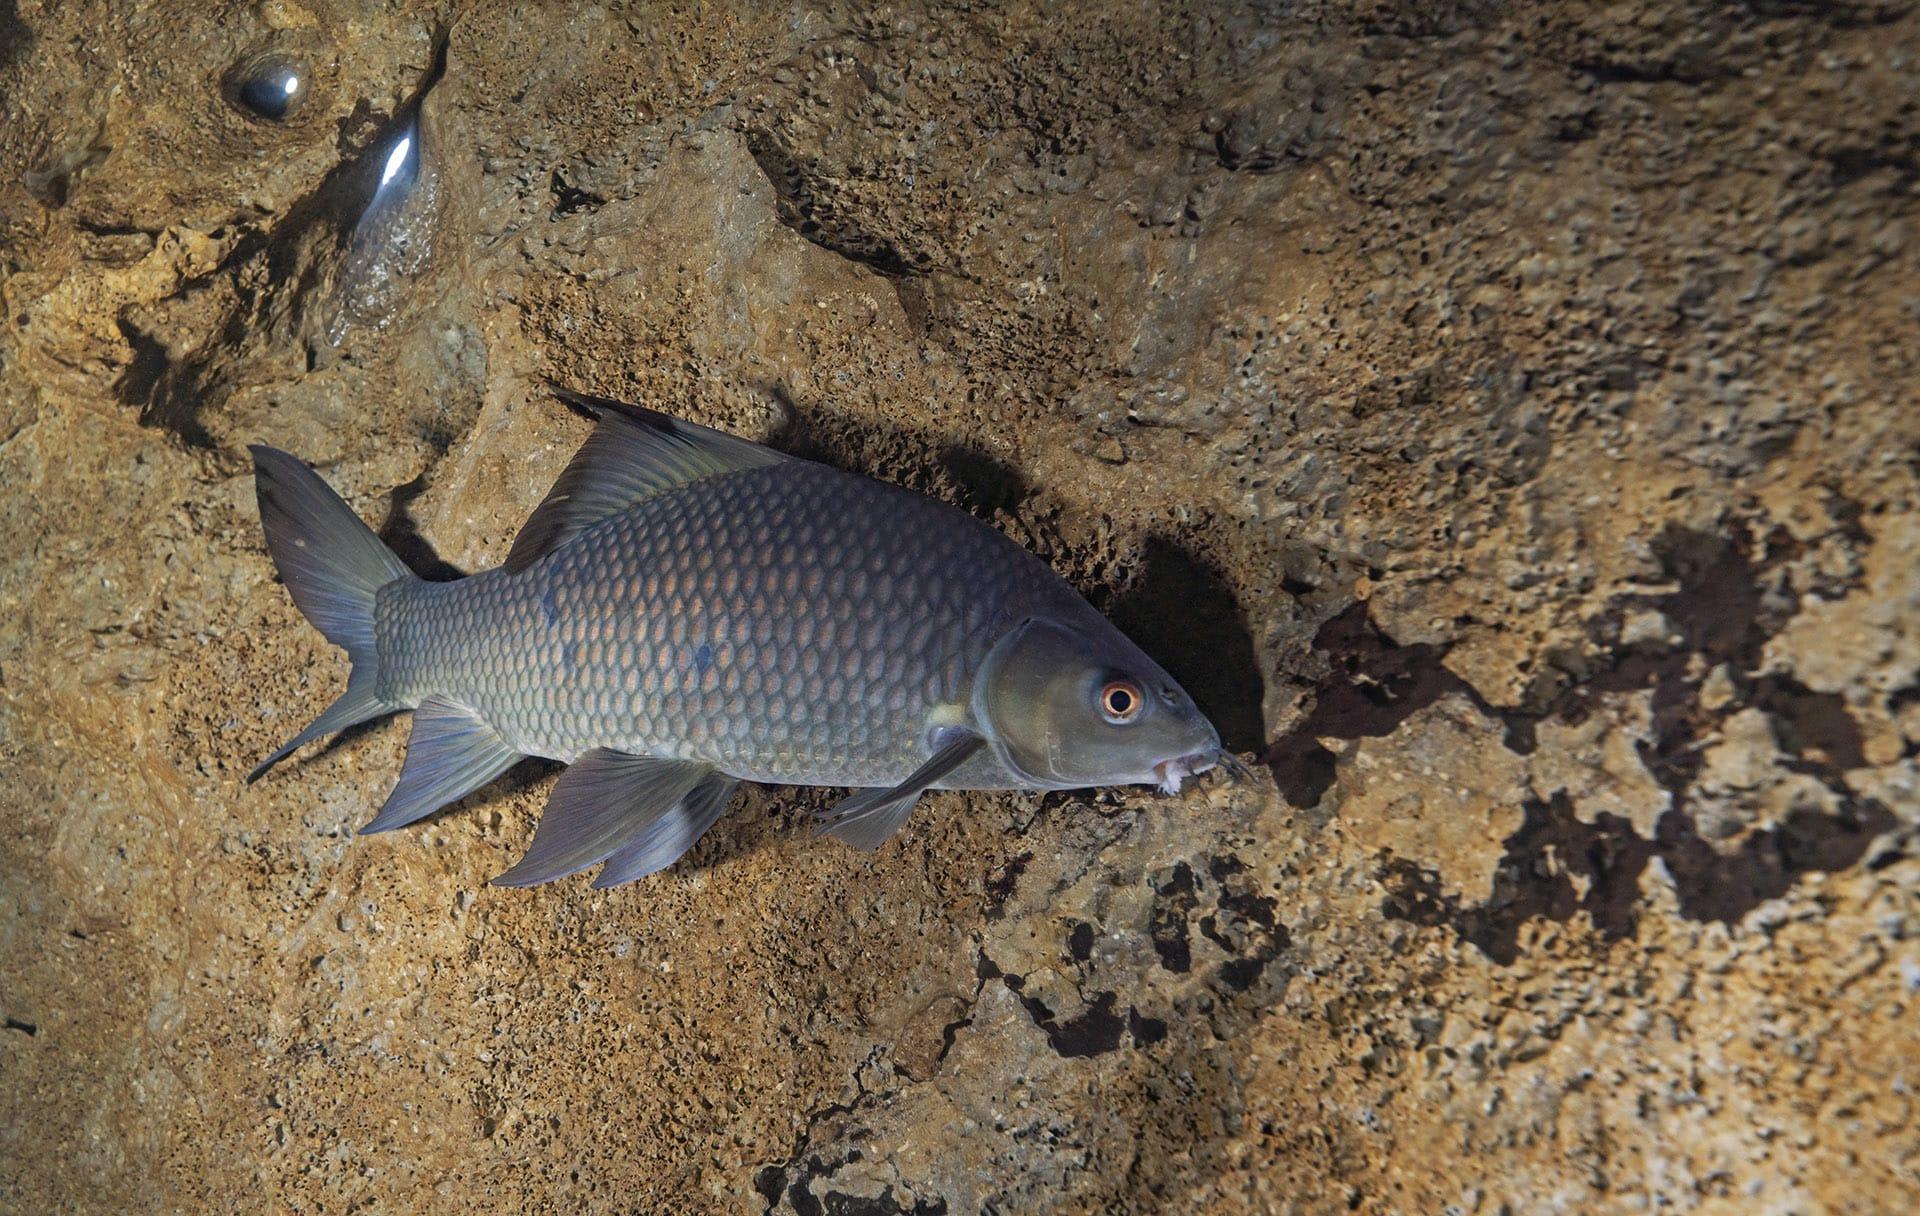 orangefin labeo fish in a cave in meghalaya